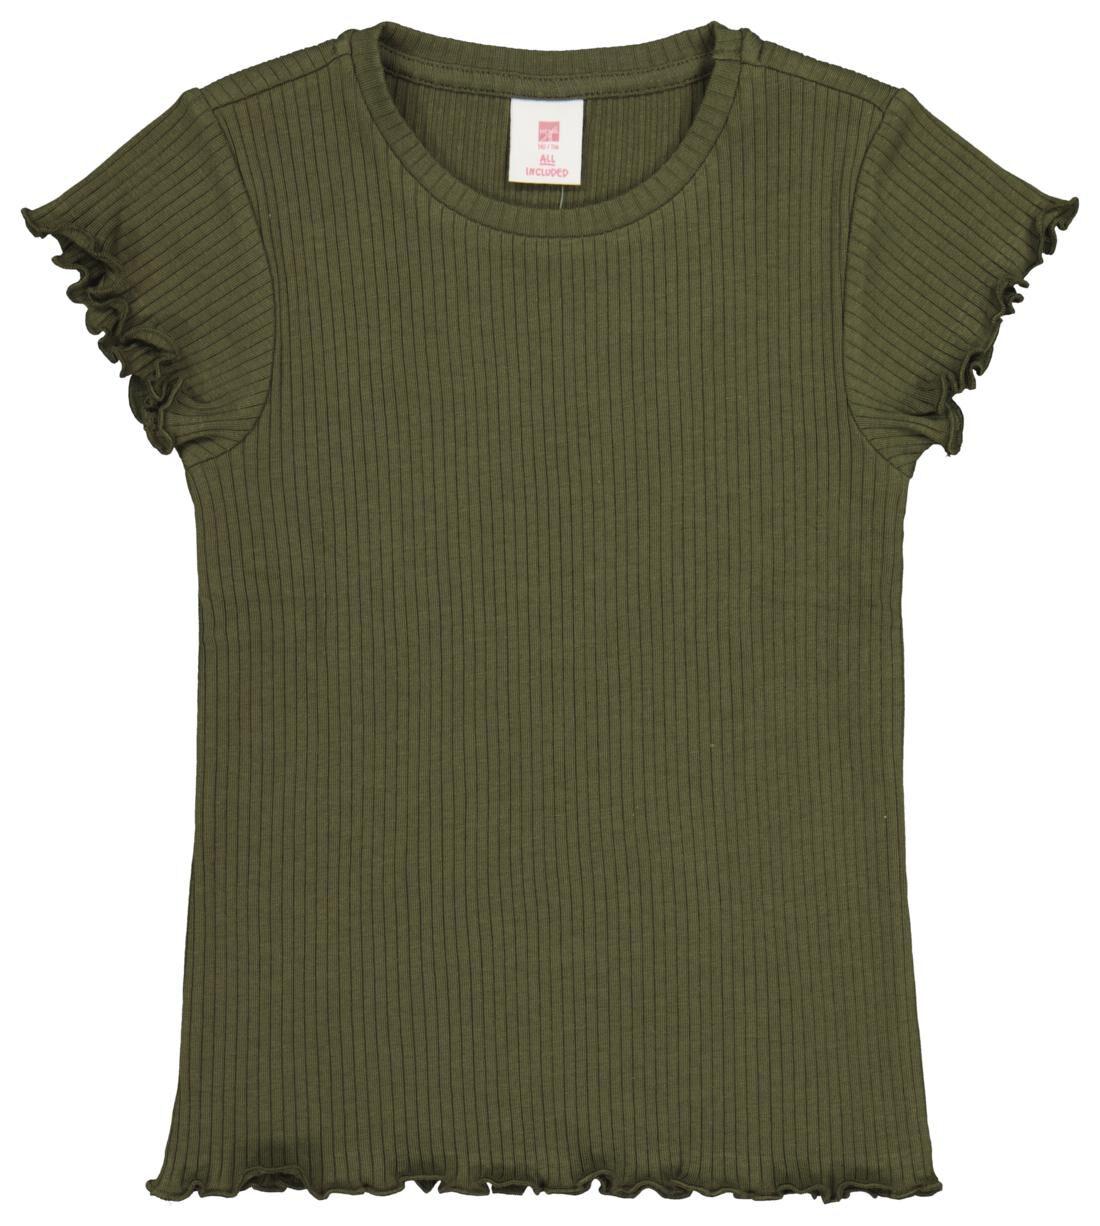 HEMA Kinder T-shirt Rib Legergroen (legergroen)